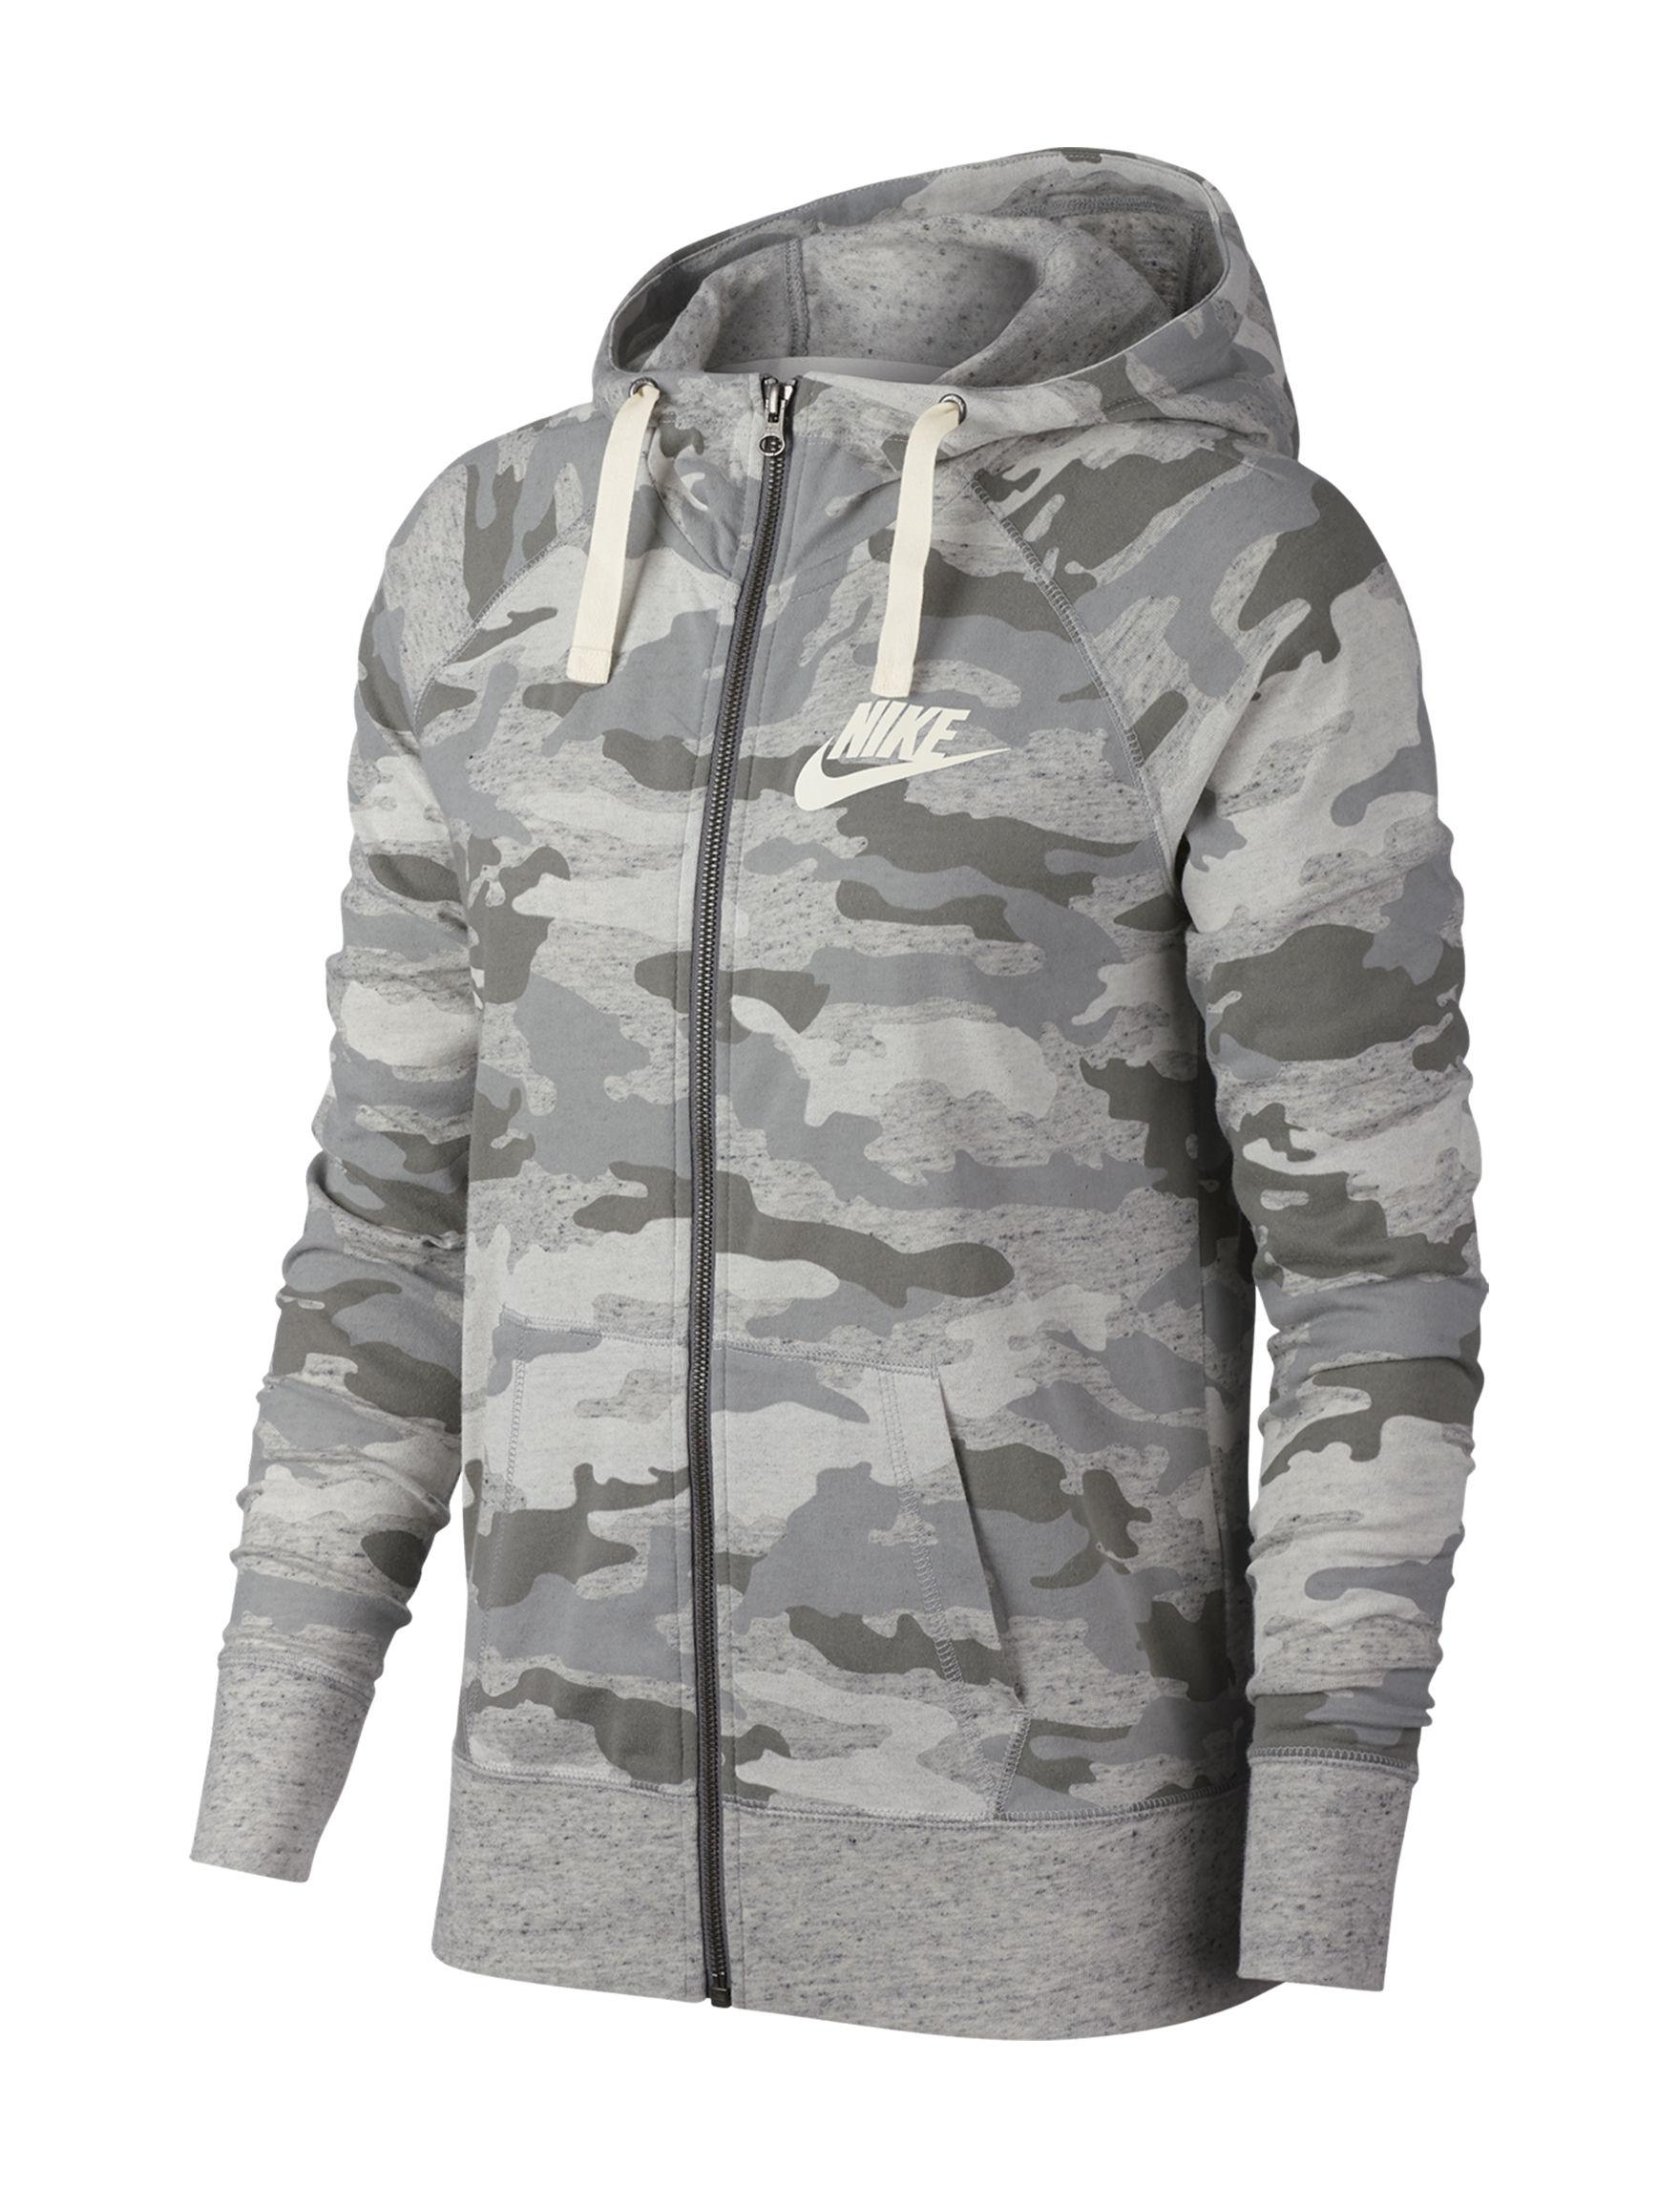 Nike Grey / Multi Active